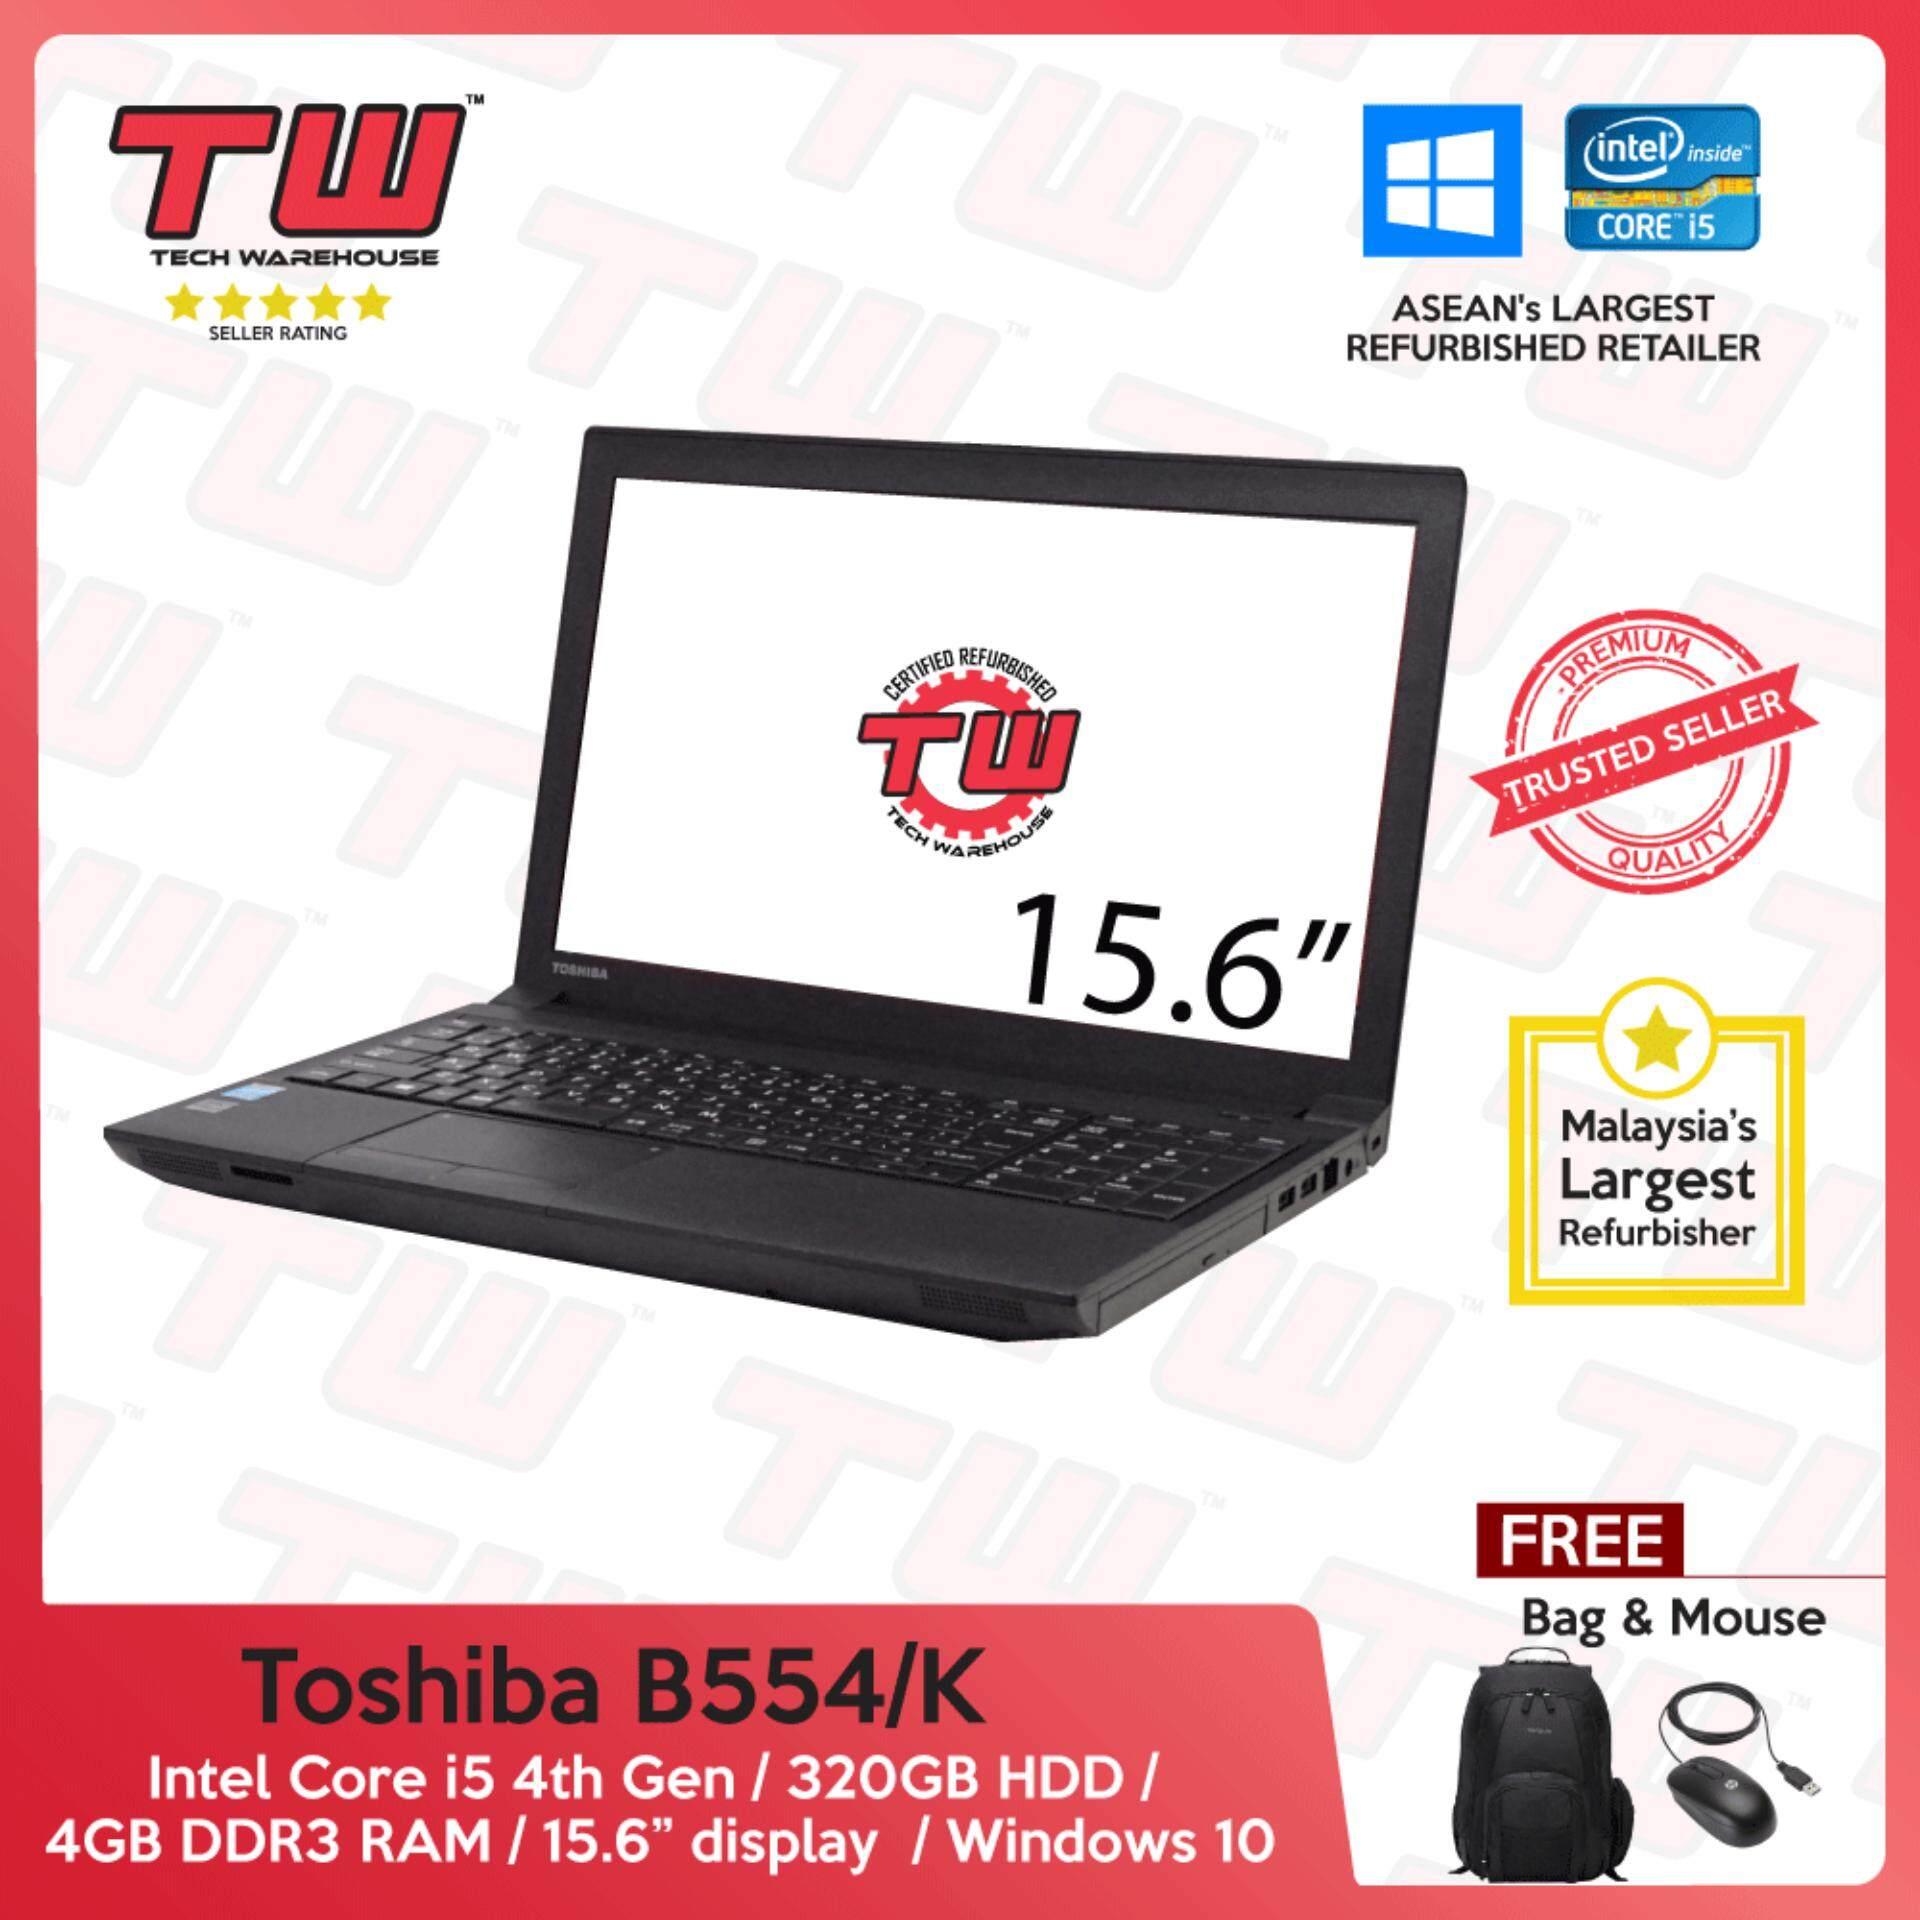 Toshiba Notebook B554/K Core i5 4th Gen 2.50GHz / 4GB RAM / 320GB HDD / Windows 10 Home Laptop / 3 Month Warranty (Factory Refurbished) Malaysia